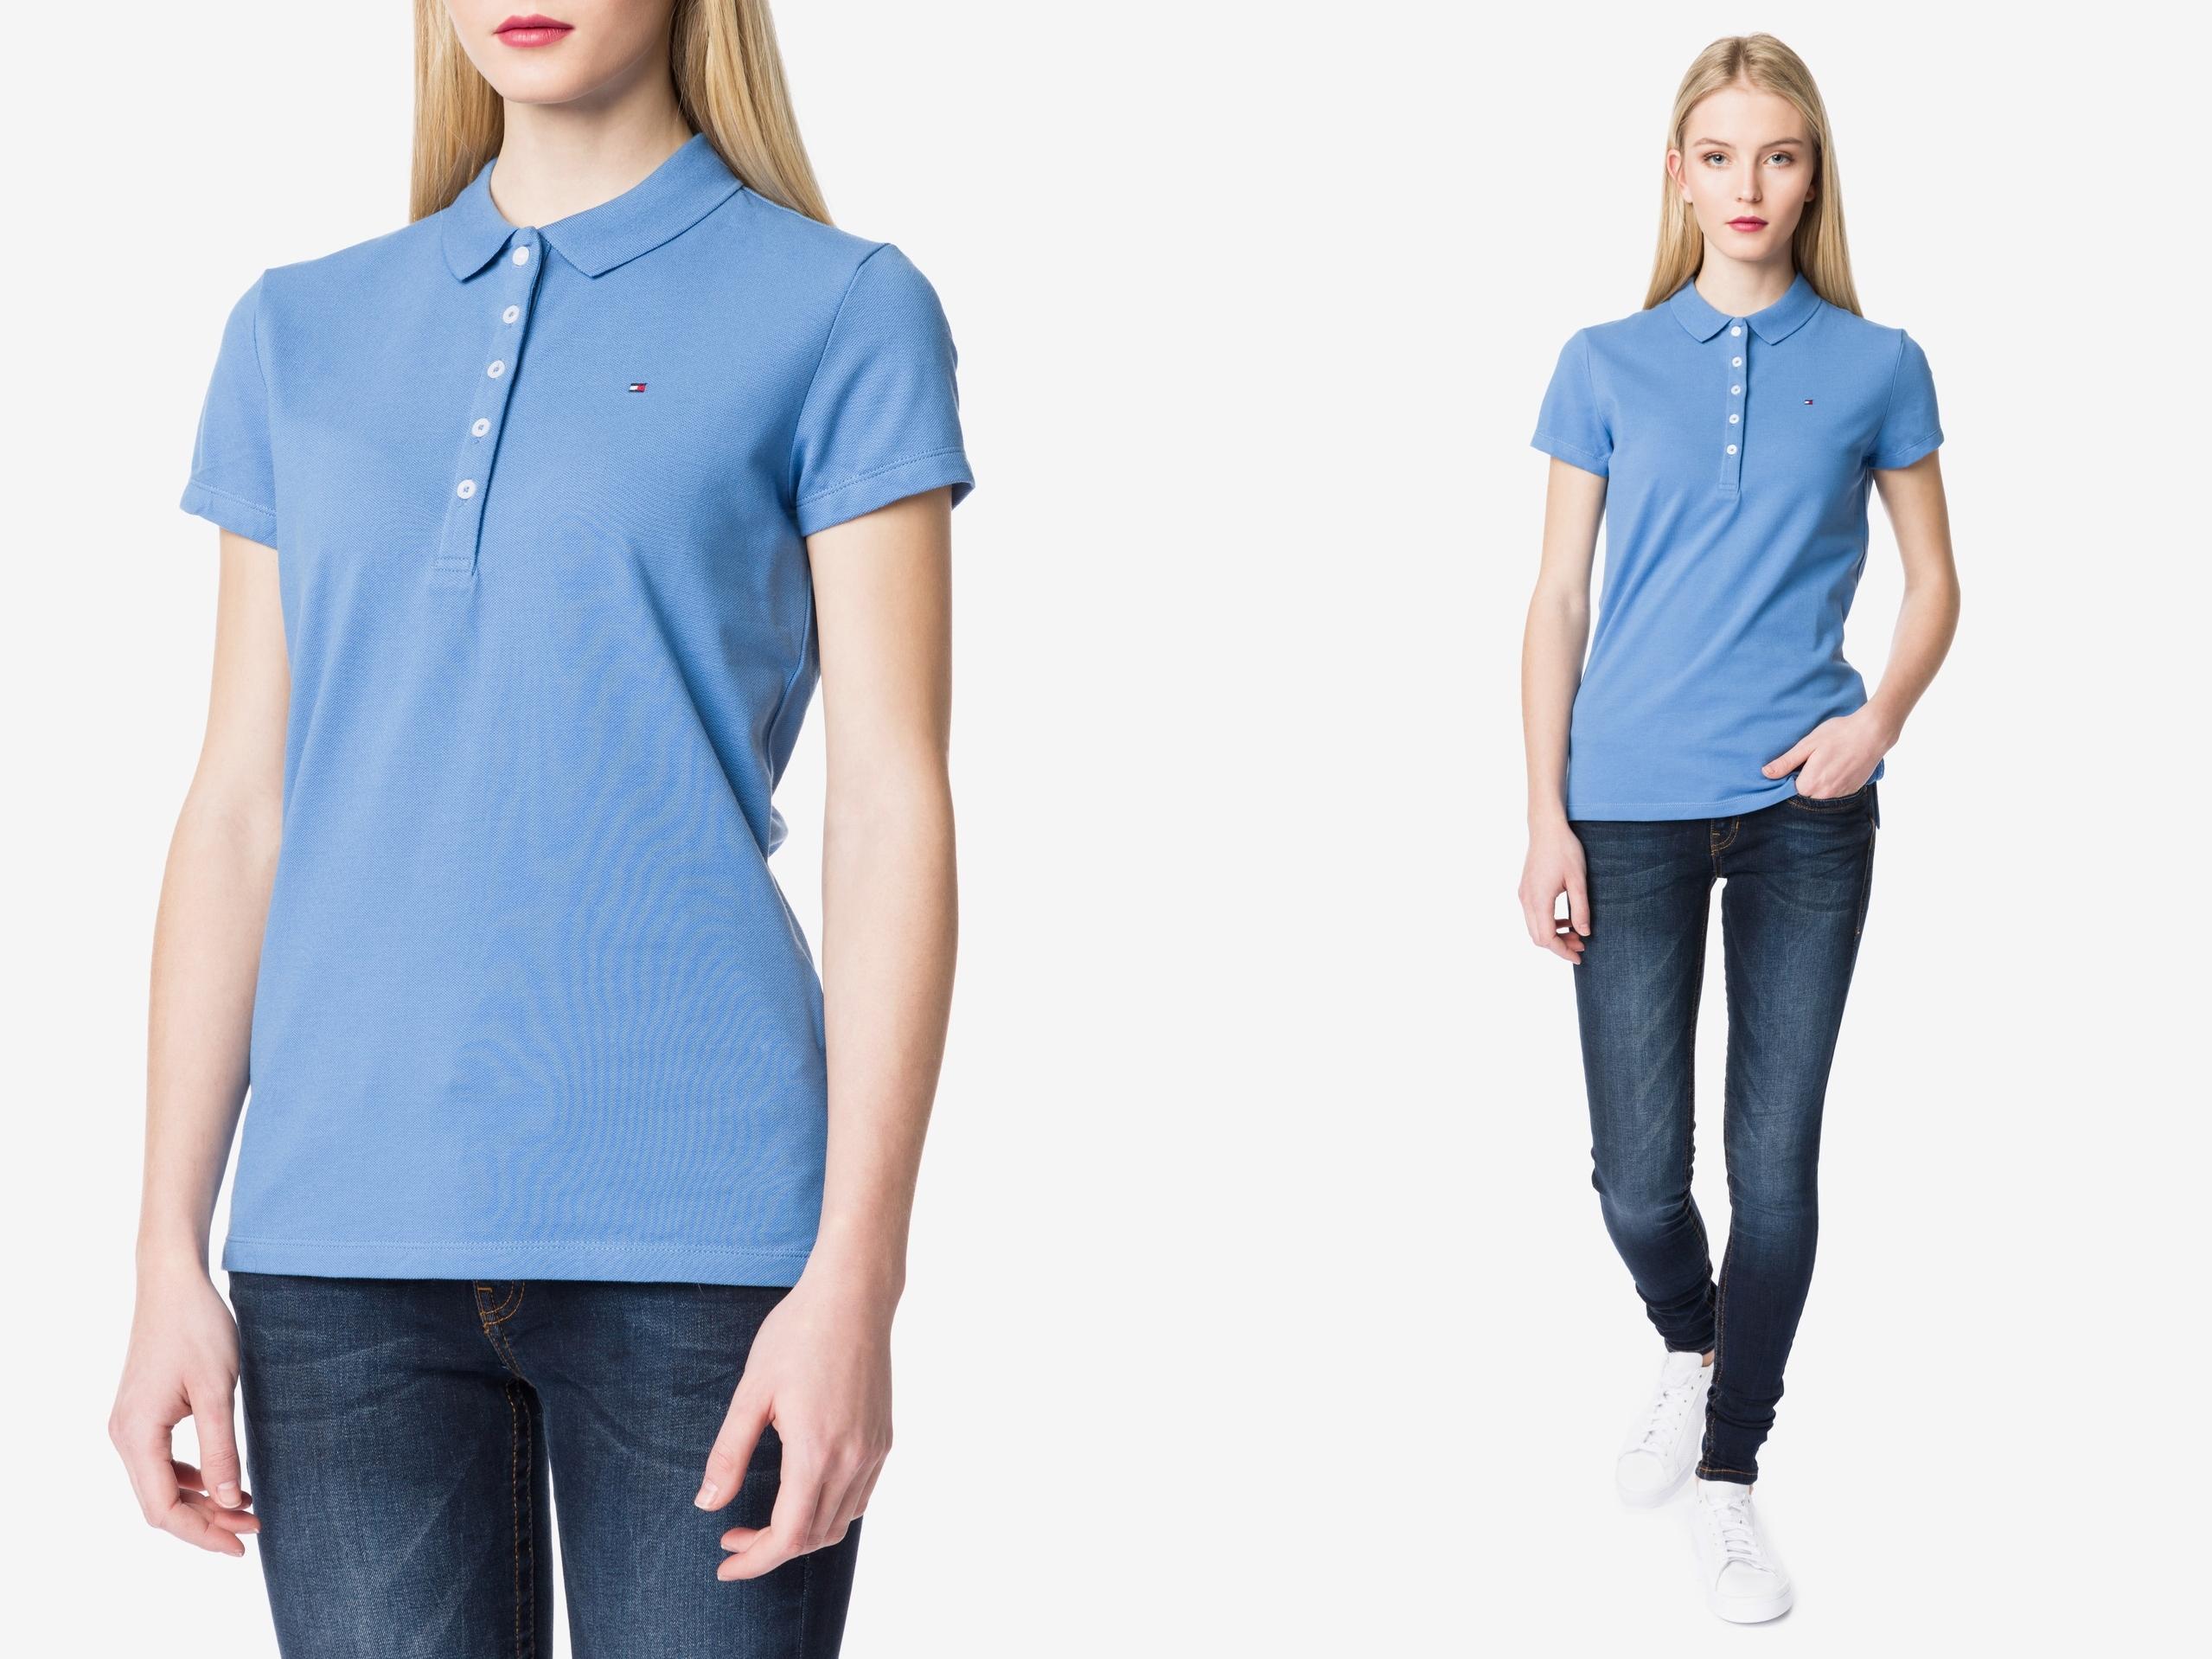 Tommy Hilfiger New Chiara Koszulka Polo Slim fit M